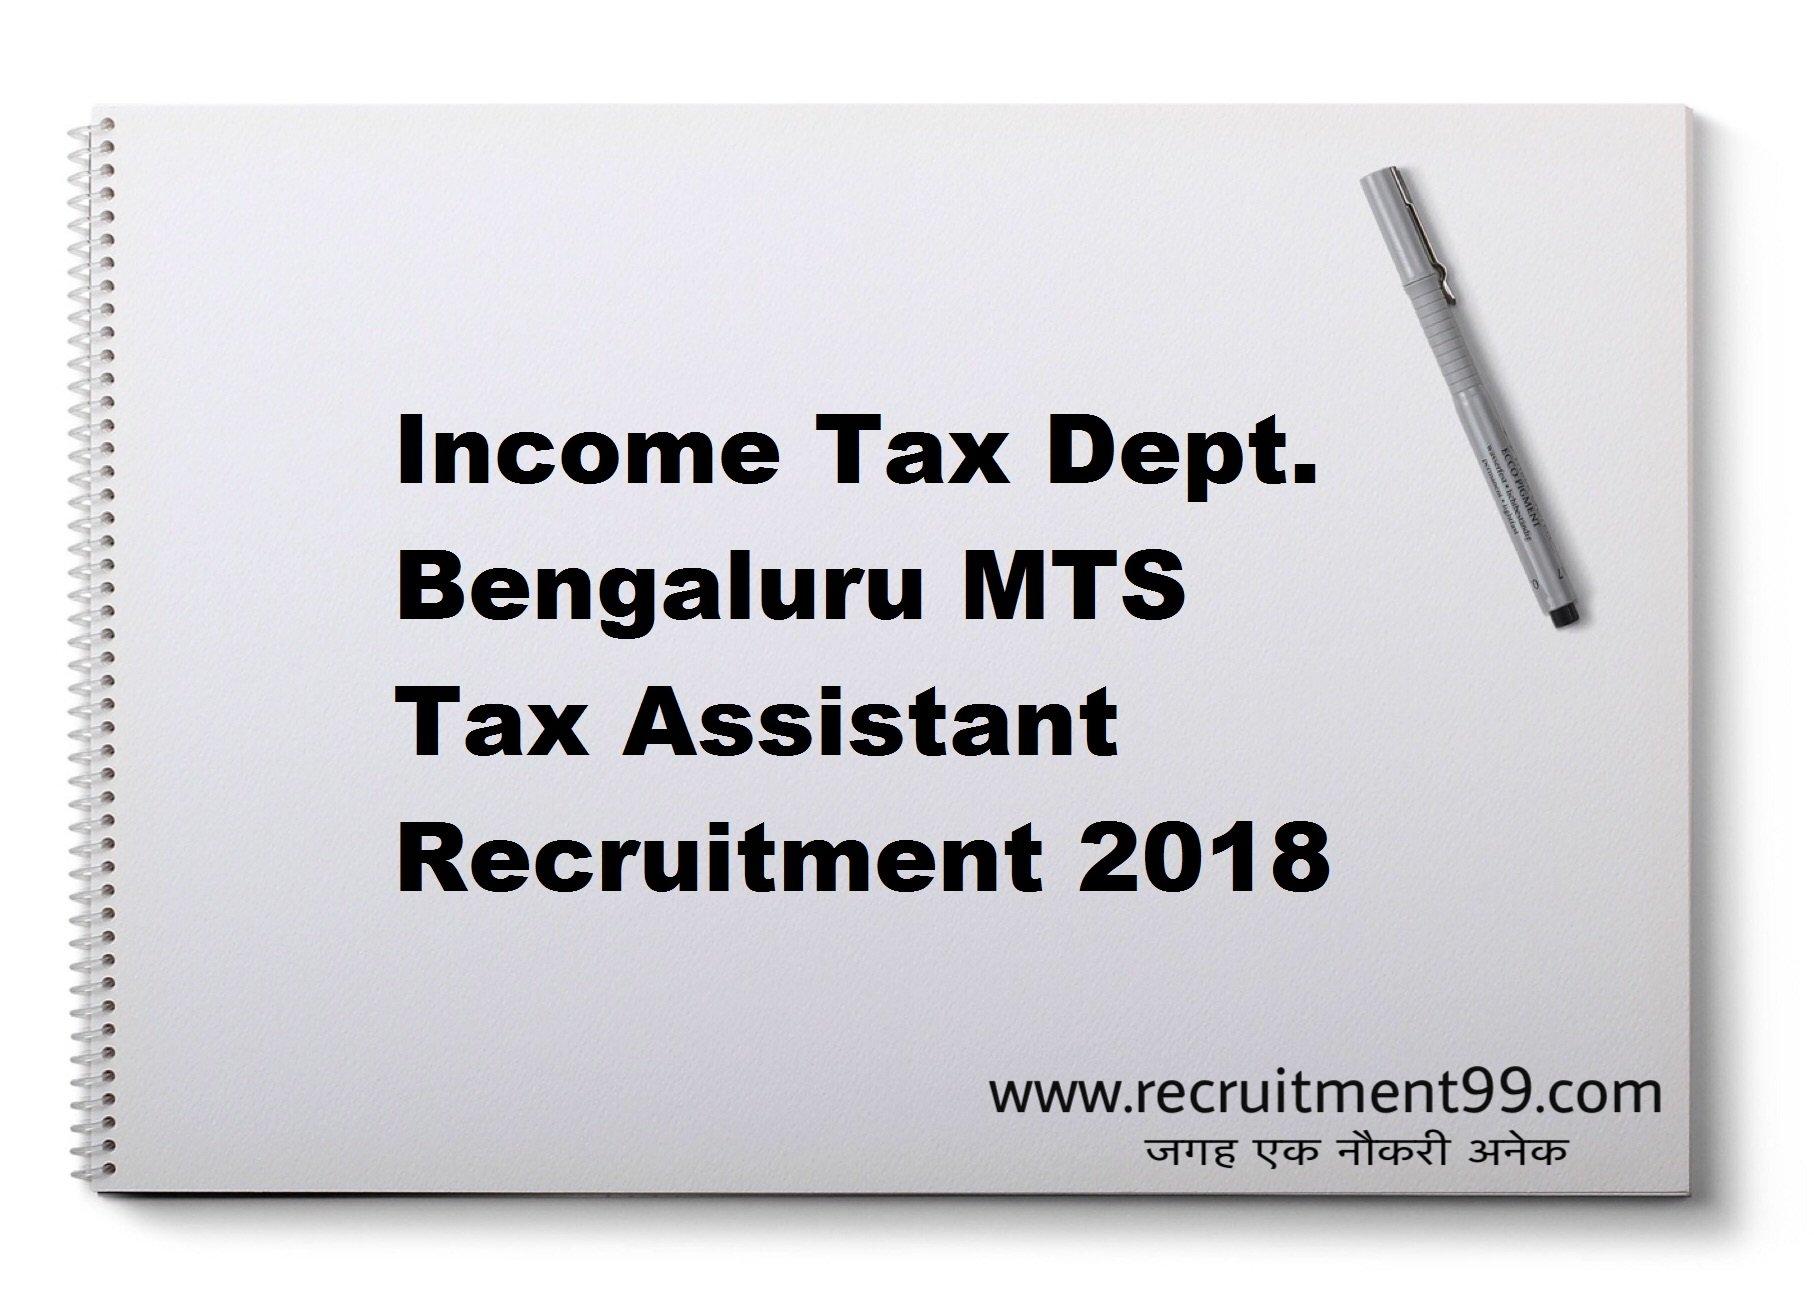 Income Tax Dept. Bengaluru MTS Tax Assistant Recruitment Admit Card Result 2018